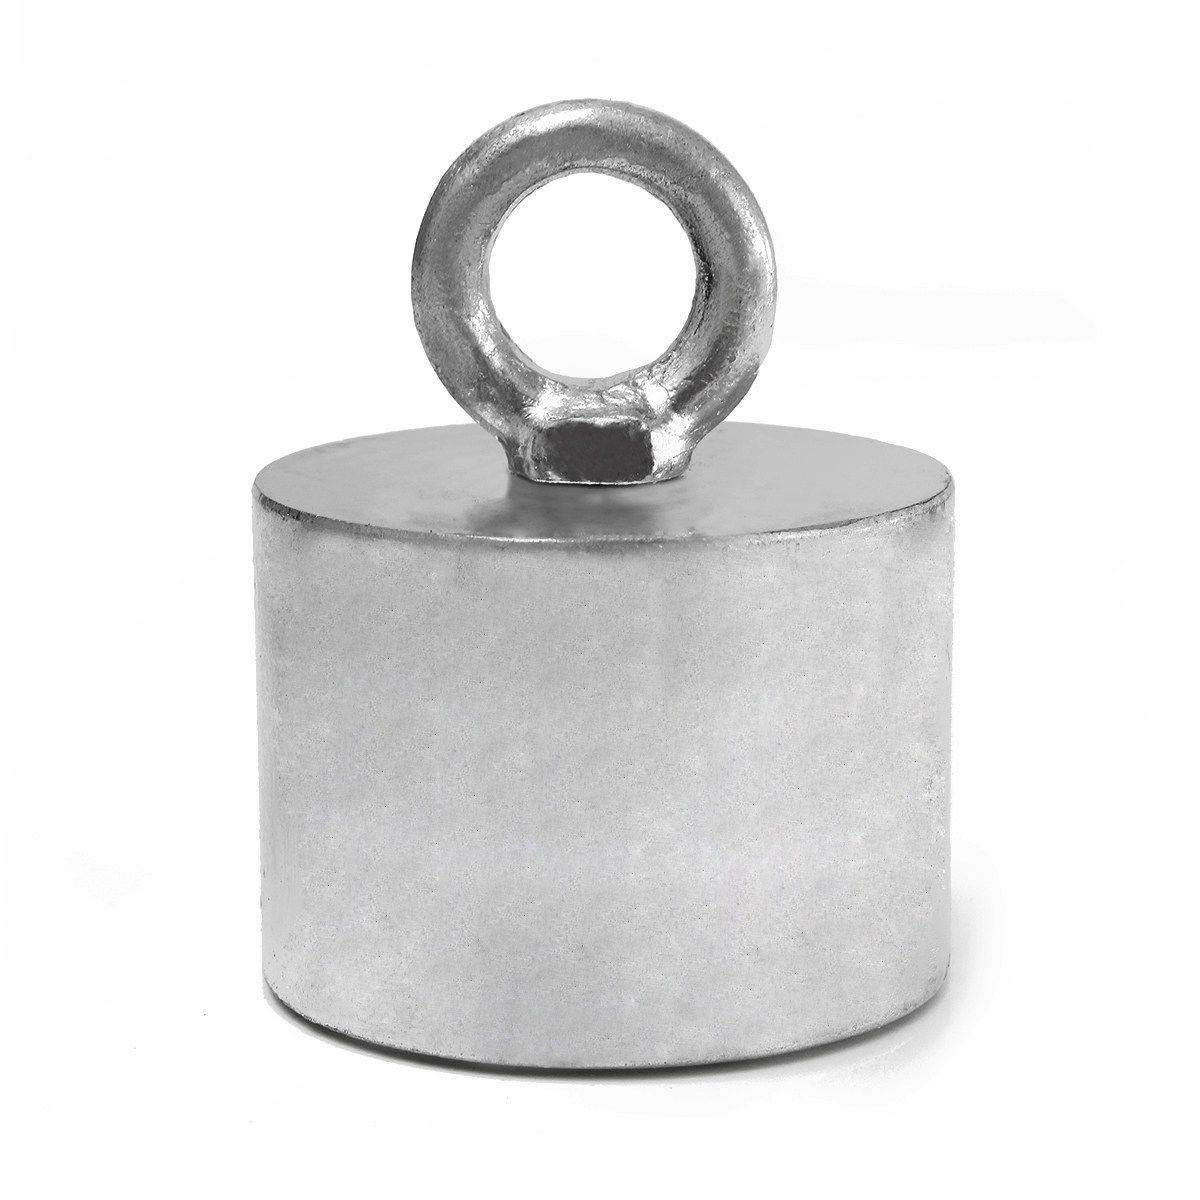 1 Stück 55x40mm 30 kg Neodym Recovery Magnet Metalldetektor mit Griff Ringscrew Hohe Qualität Leistungsstarke